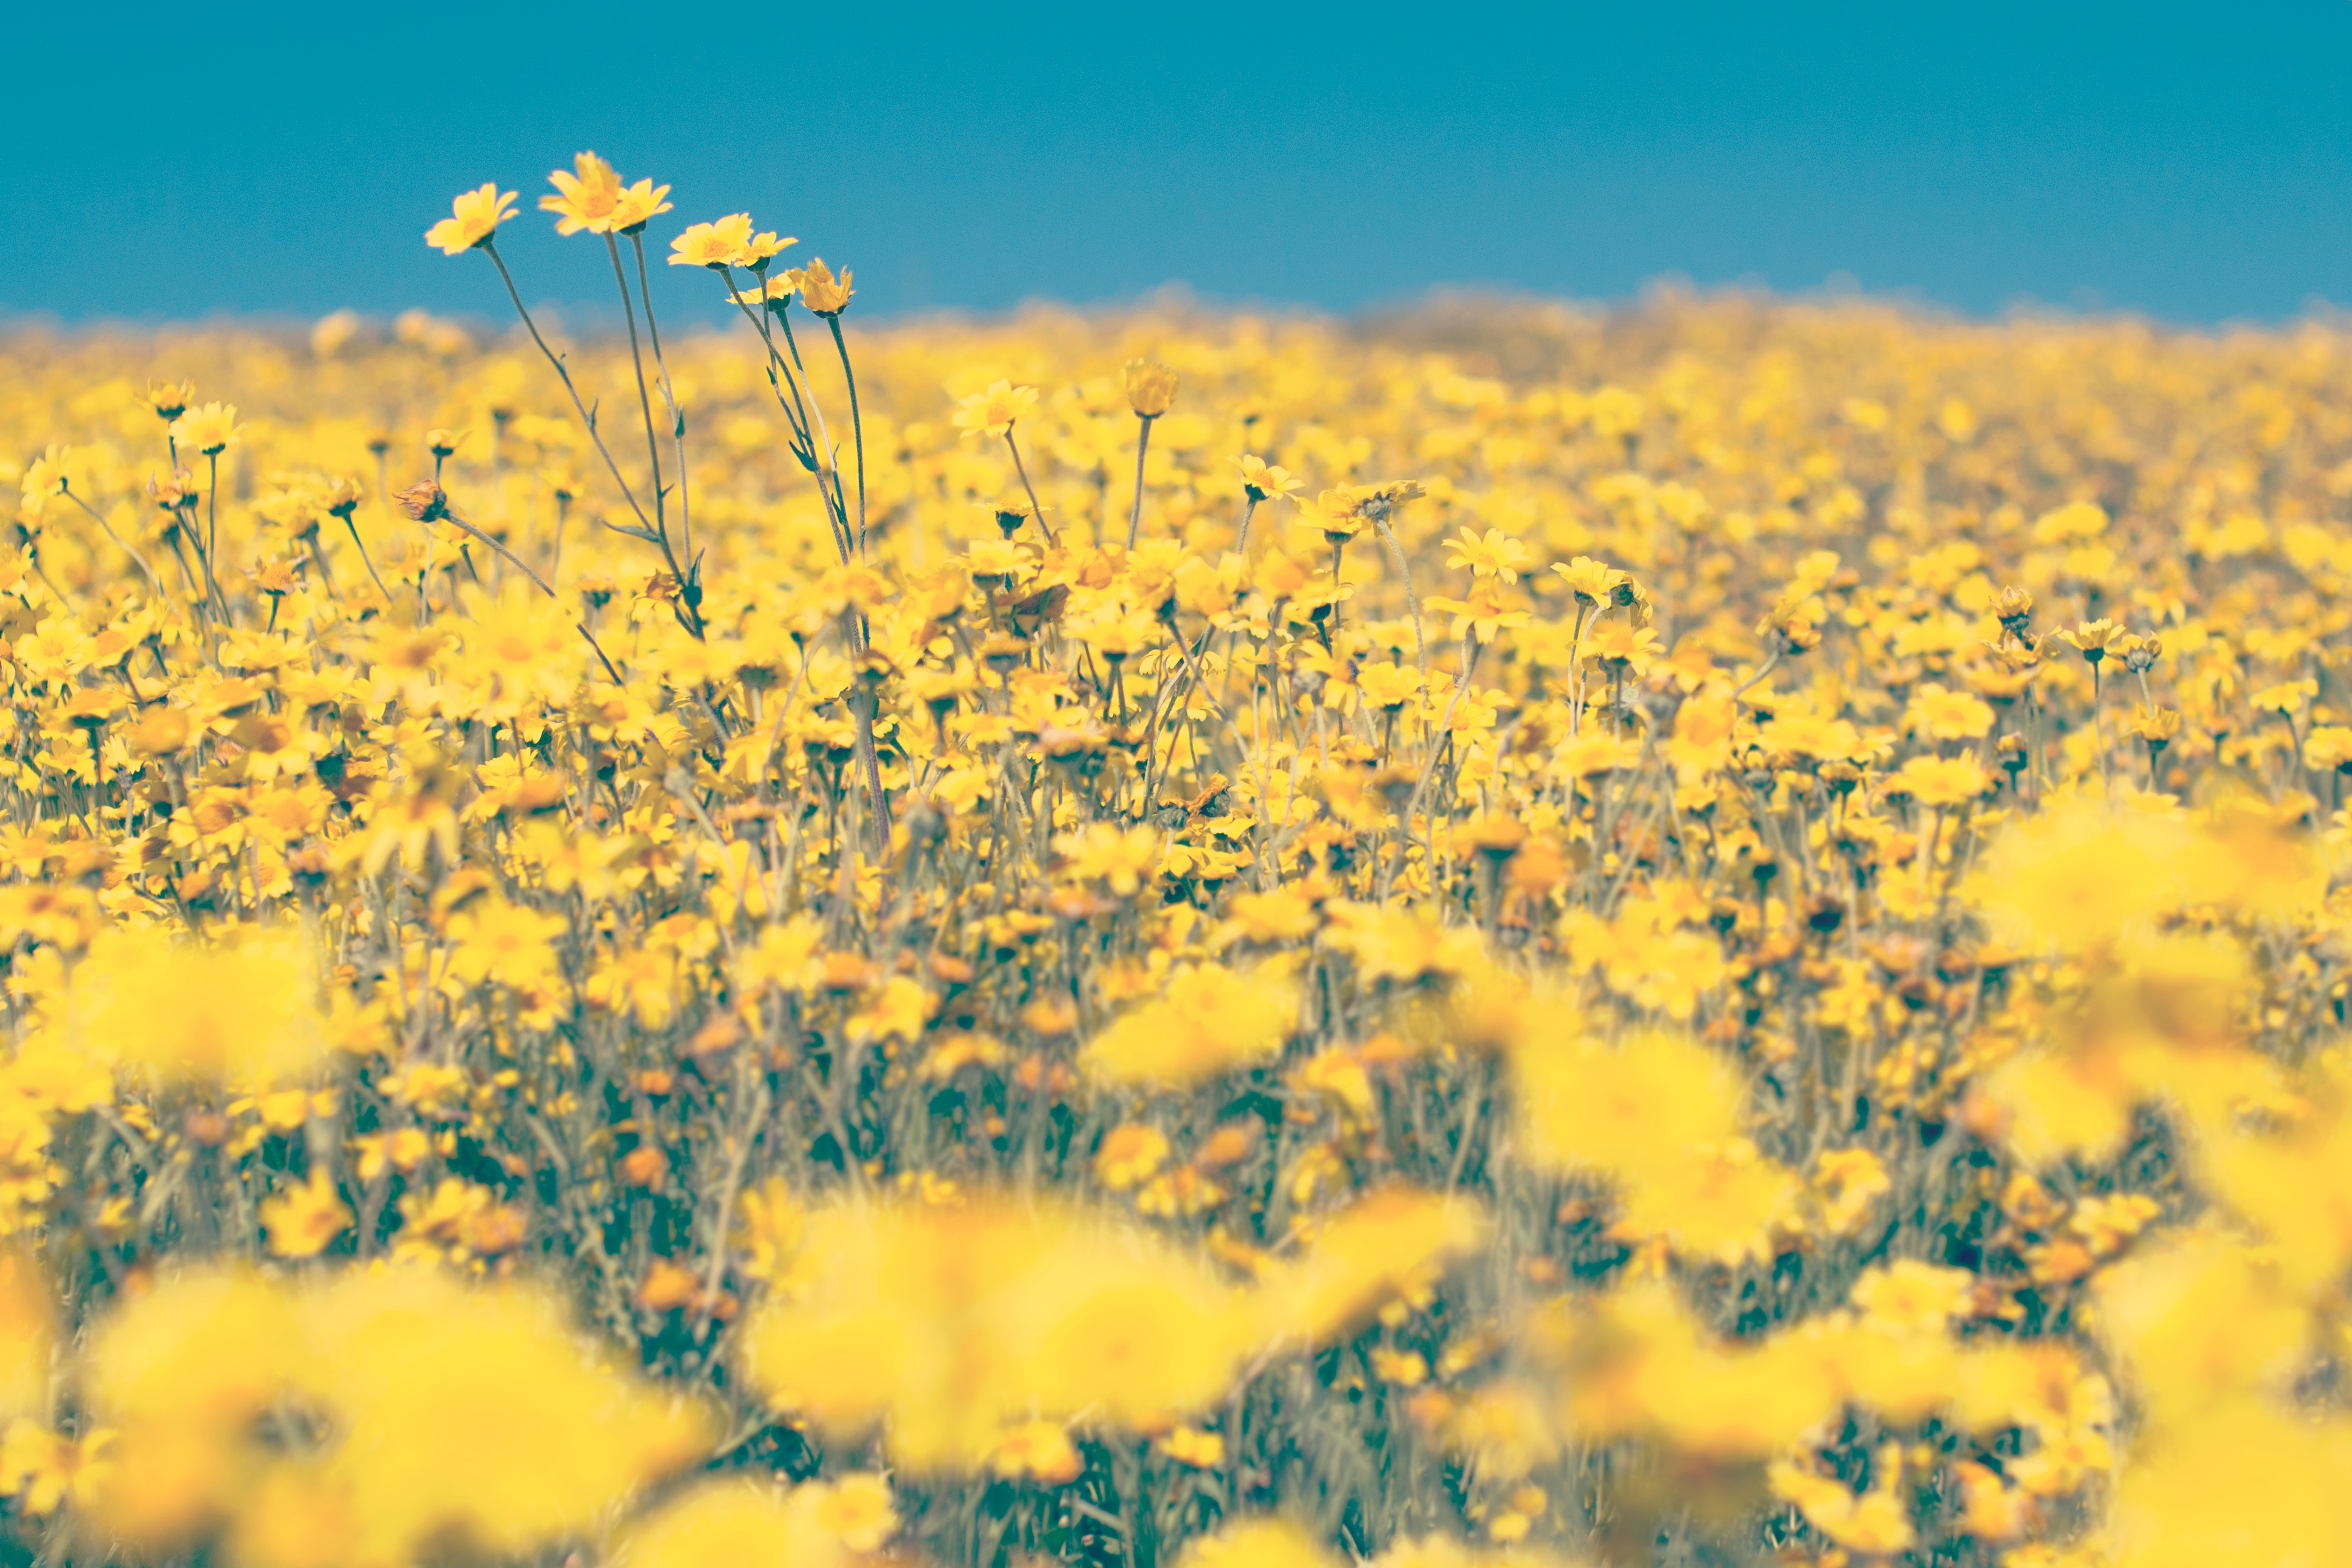 1000 Interesting Wild Flowers Photos Pexels Free Stock Photos